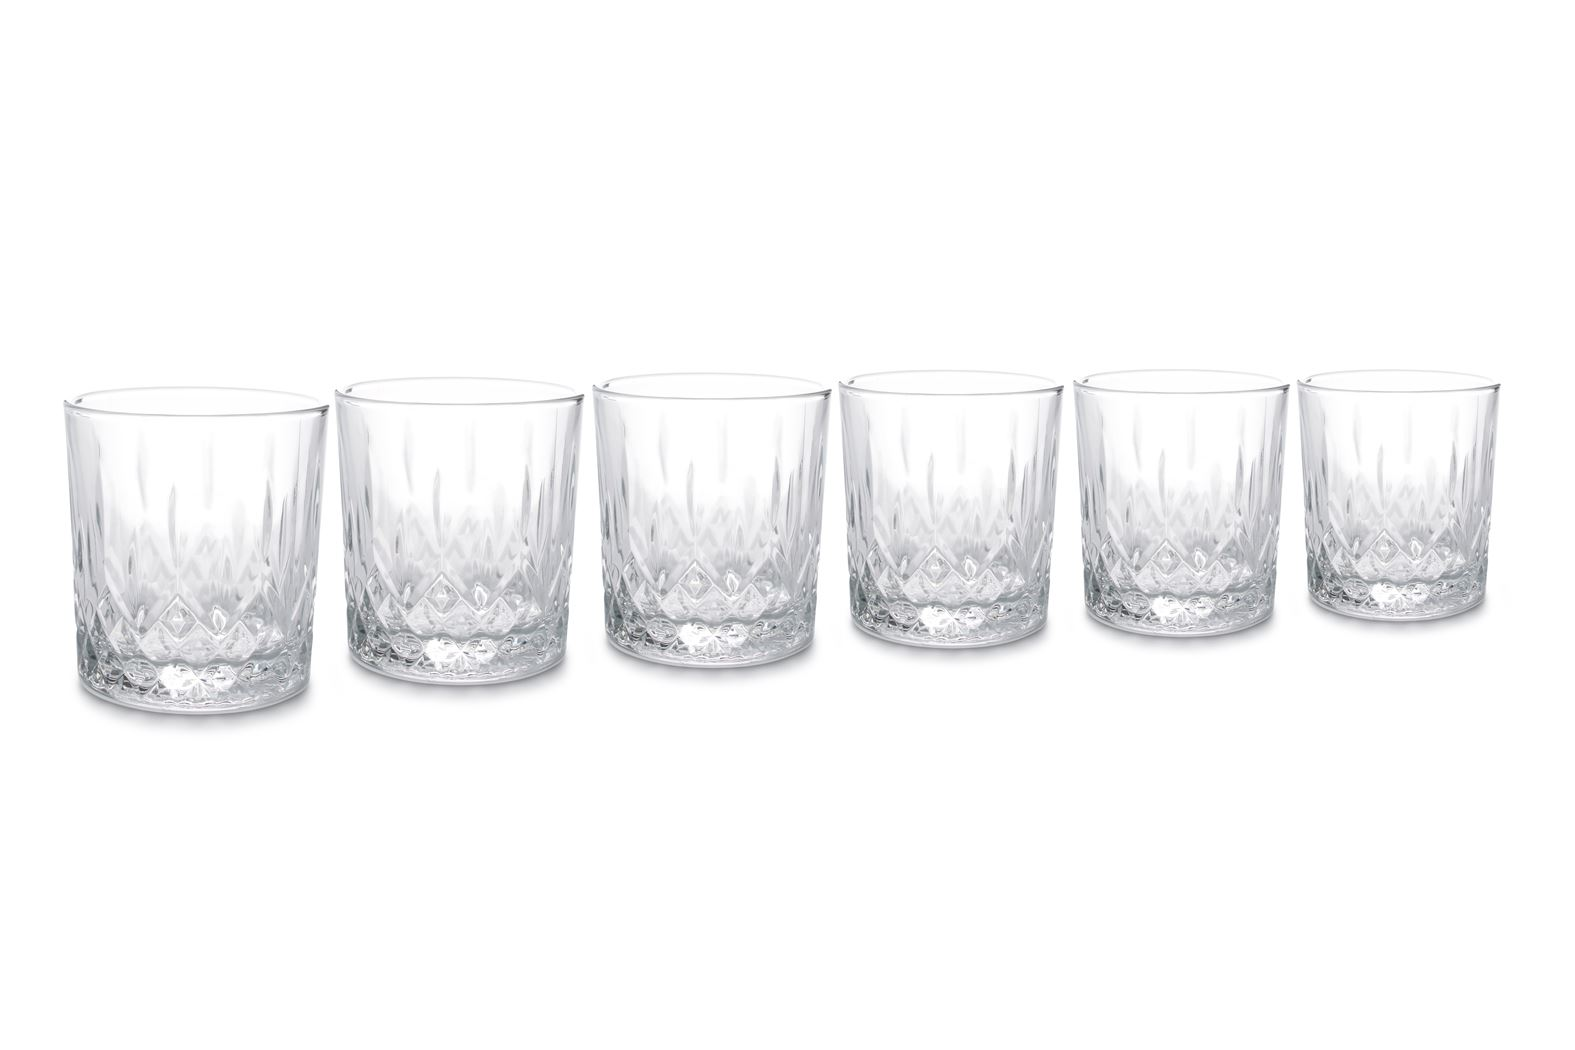 glas spirit (6sts)